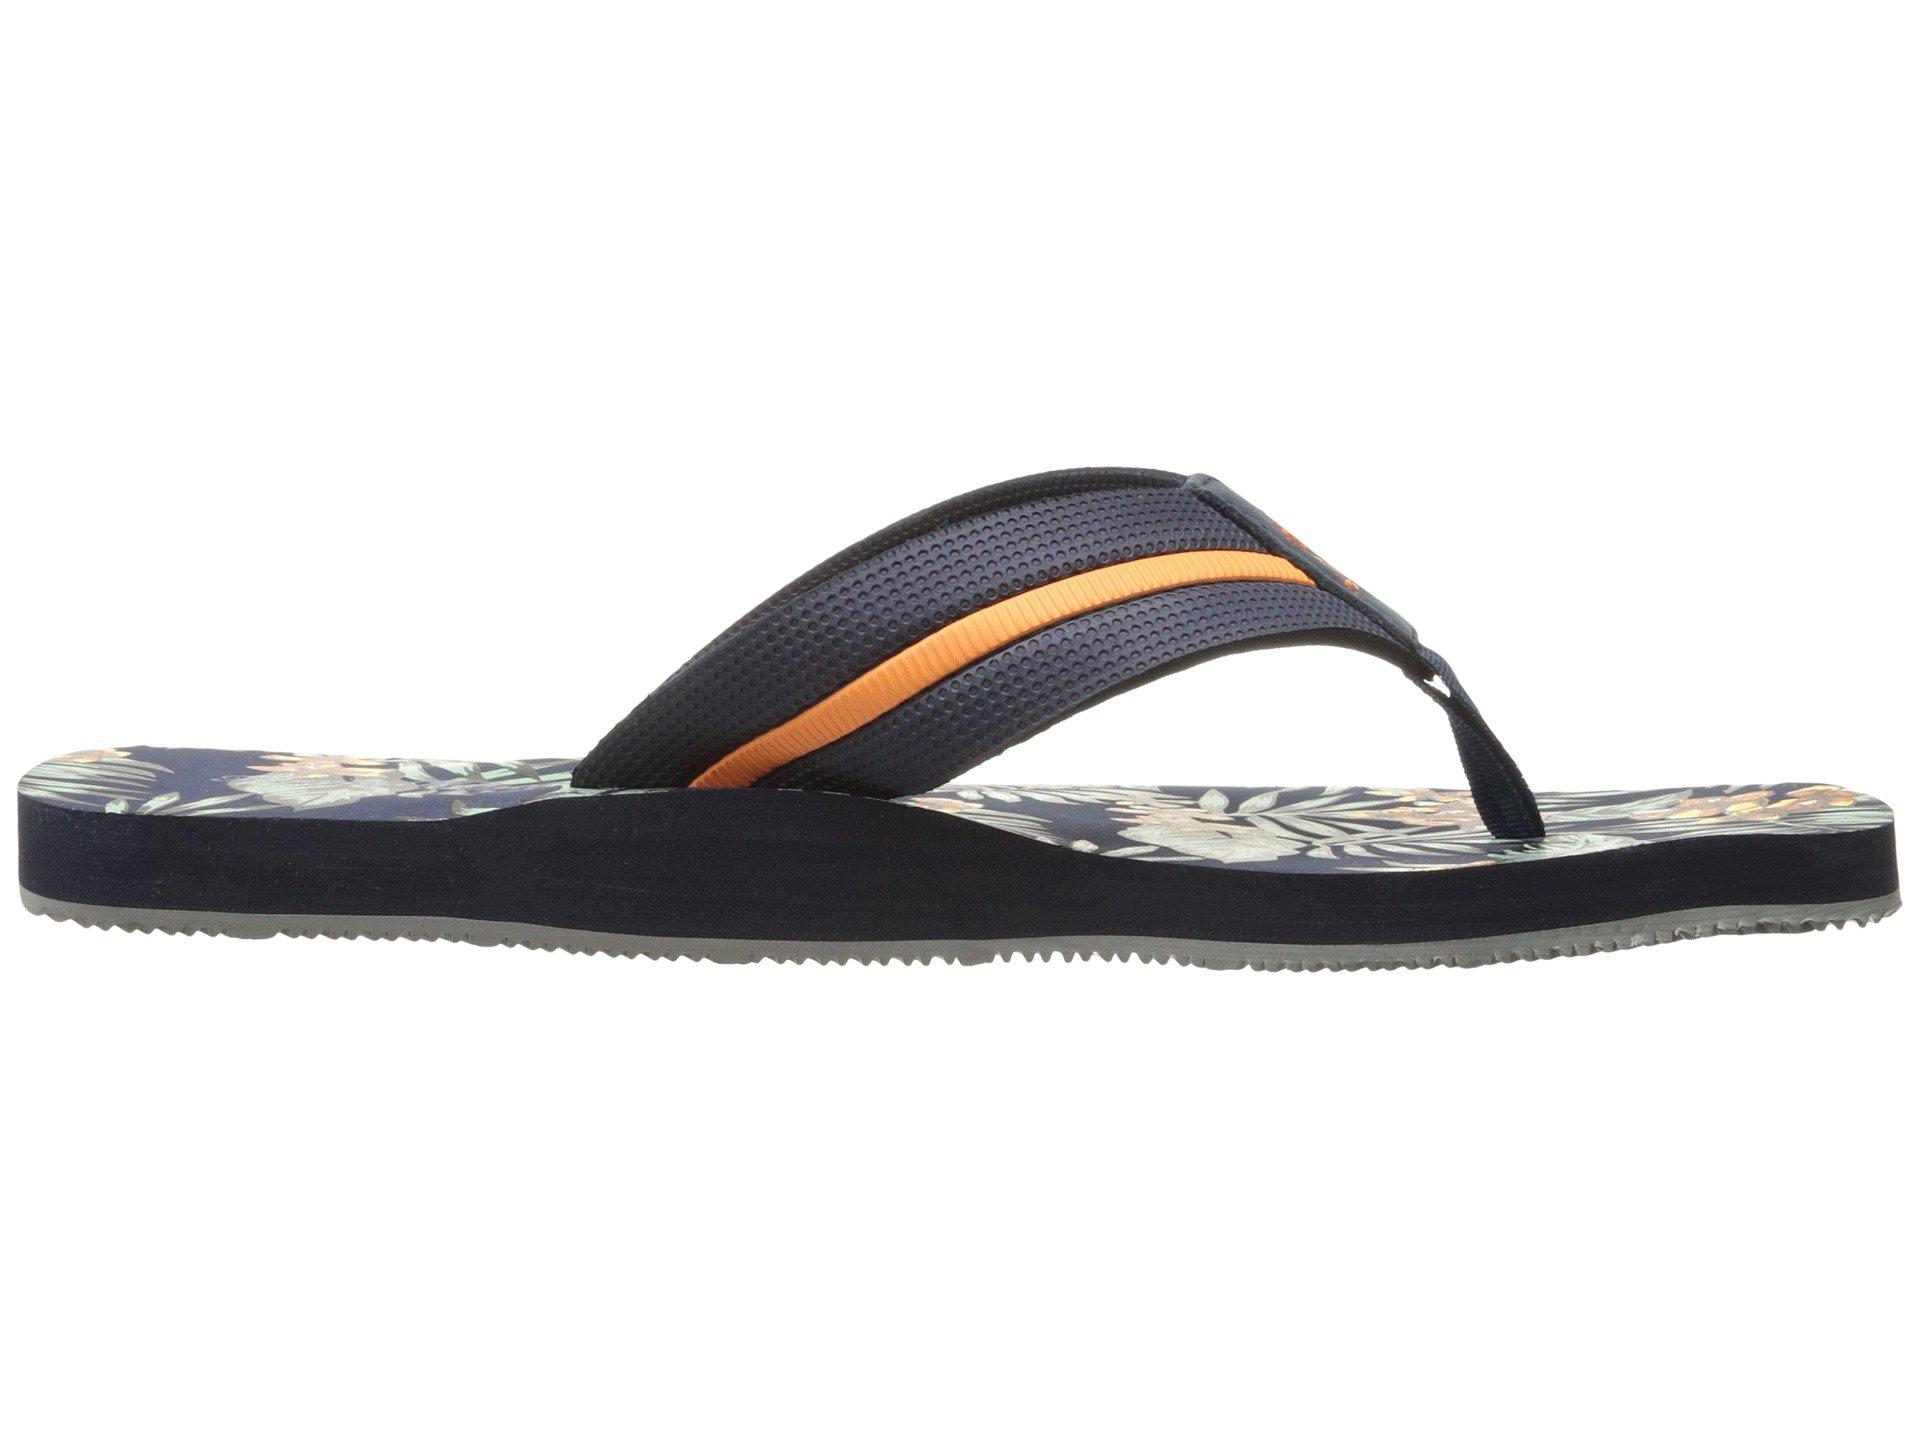 9242f1efea58 Tommy Bahama Mens Taheeti Print Ocean Depth Flip Flop Sandals